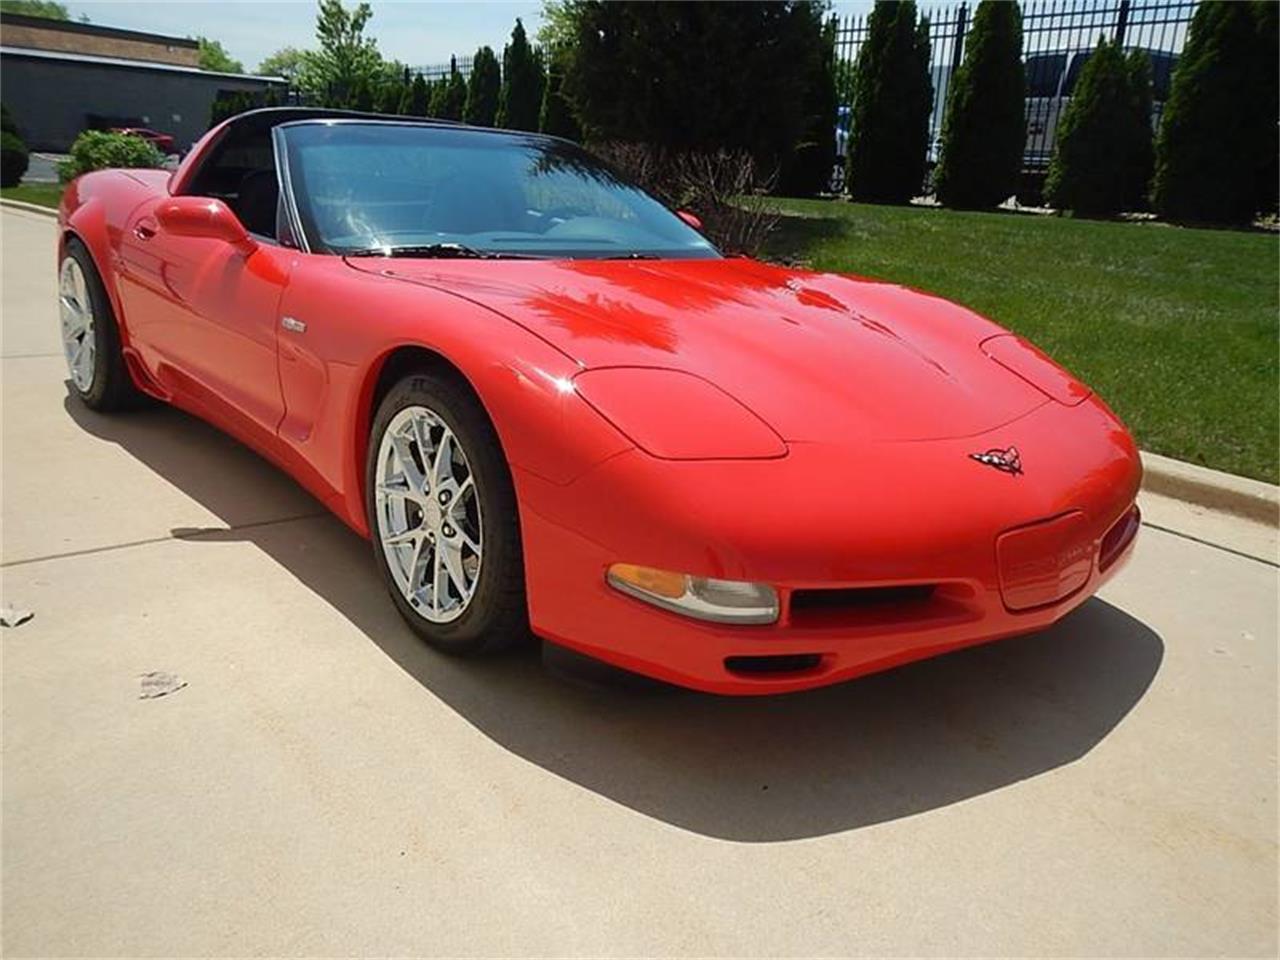 1997 Corvette For Sale >> For Sale 1997 Chevrolet Corvette In Burr Ridge Illinois